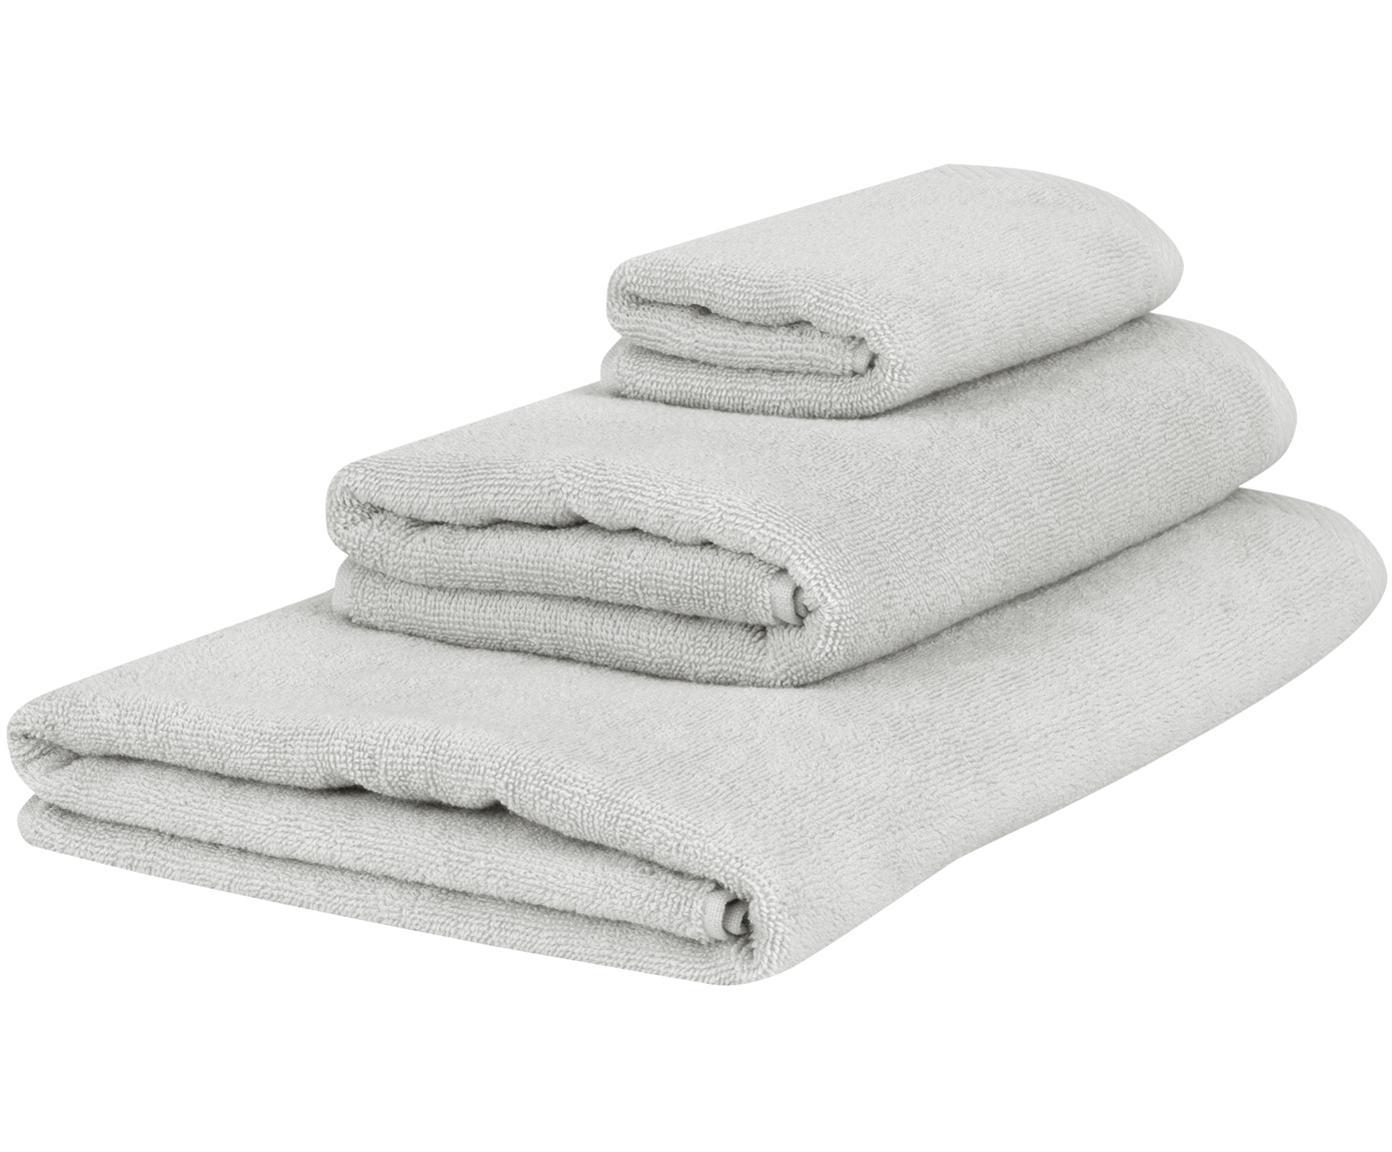 Set de toallas Comfort, 3pzas., Gris claro, tamaños diferentes